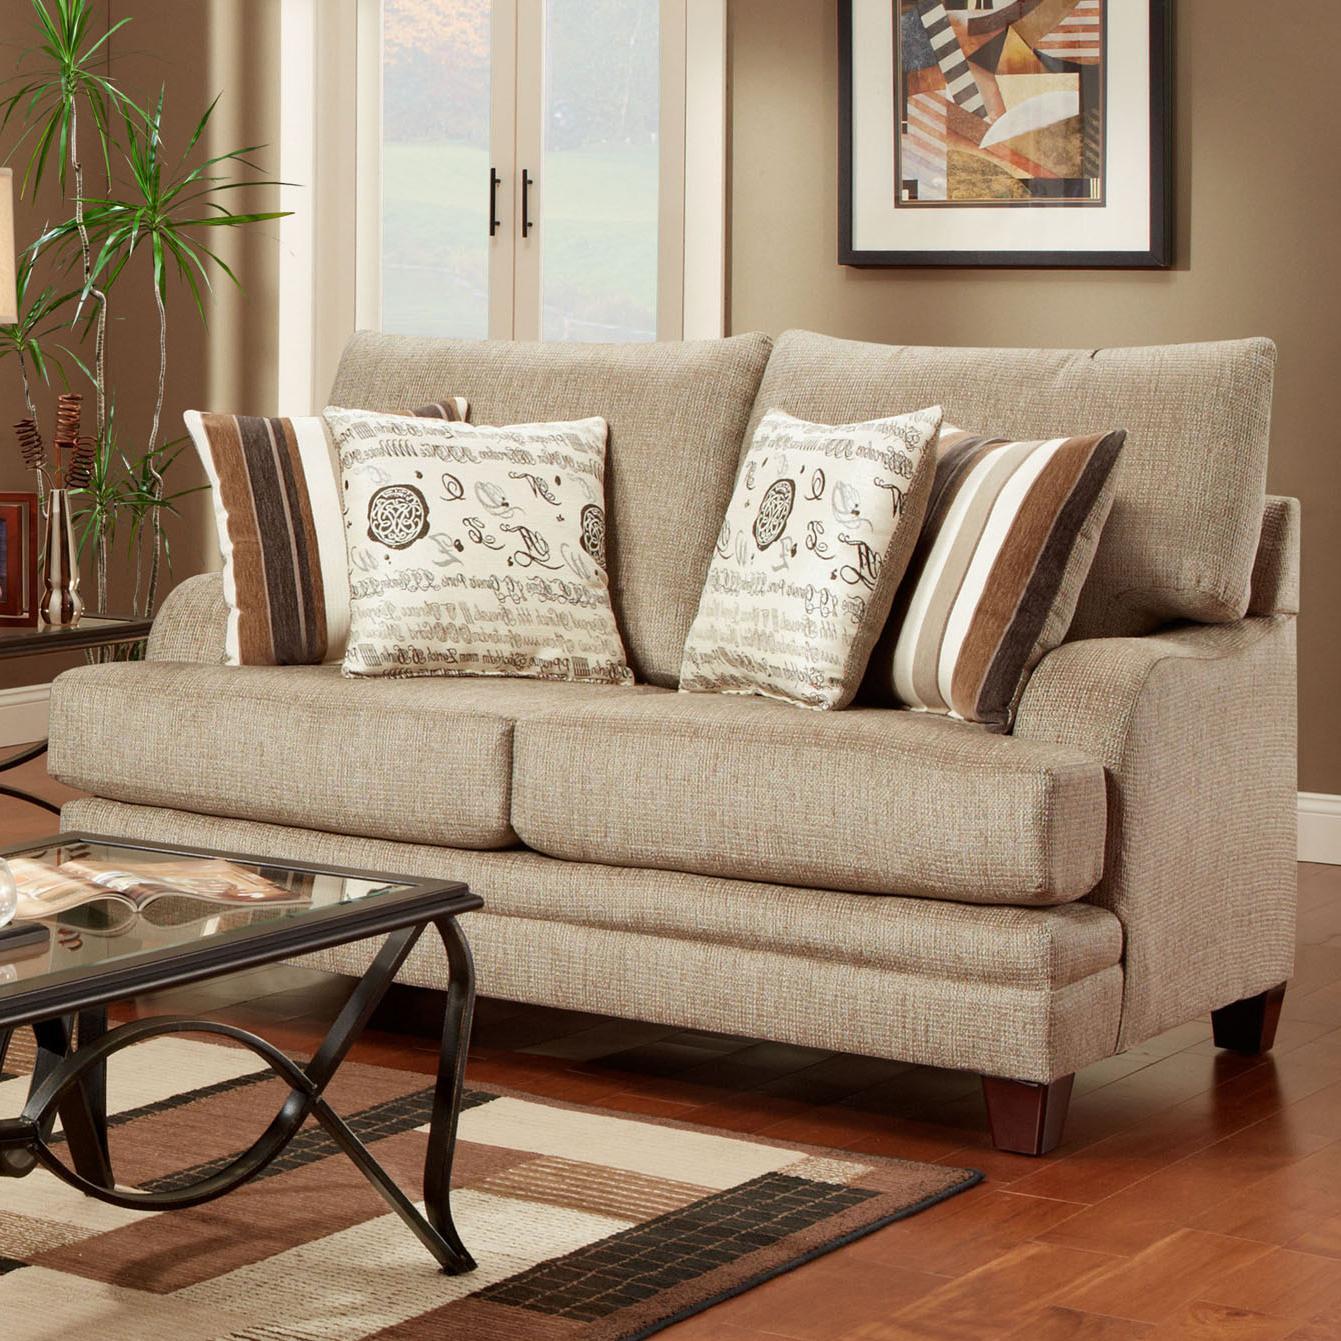 2230 Transitional Loveseat by Washington Furniture at Lynn's Furniture & Mattress